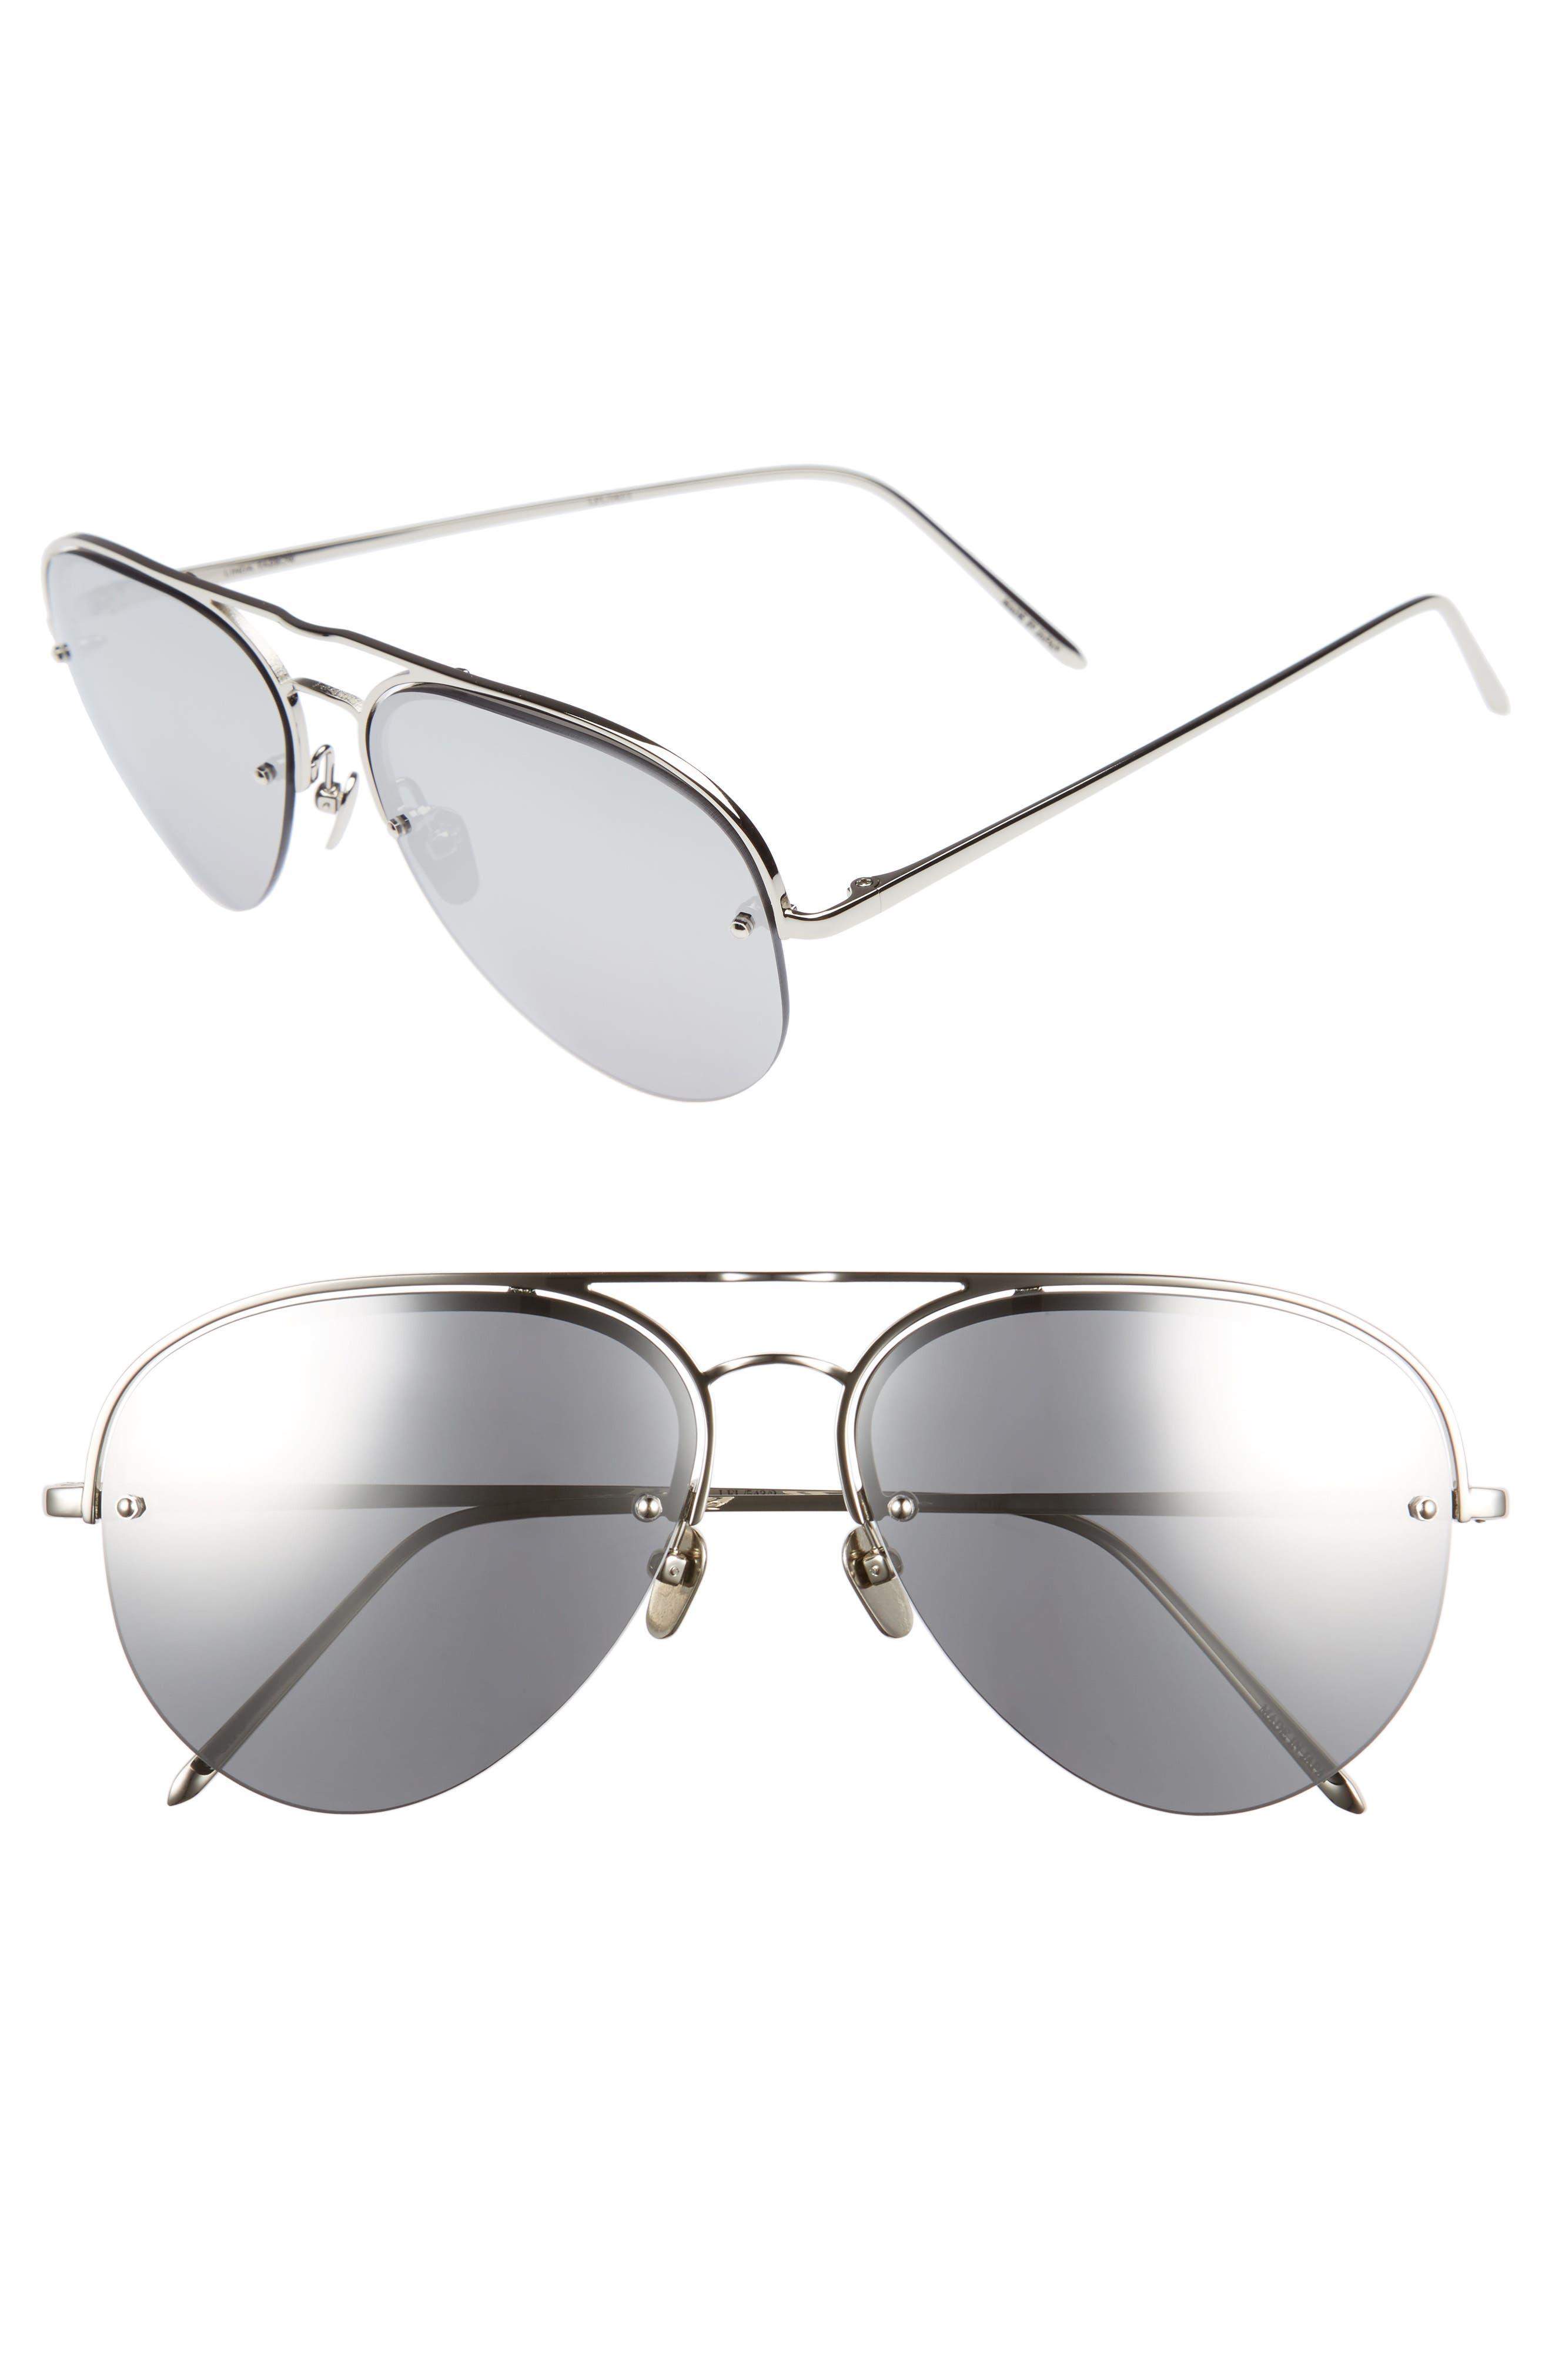 60mm Mirrored 18 Karat Gold Aviator Sunglasses,                             Main thumbnail 1, color,                             White Gold/ Platinum